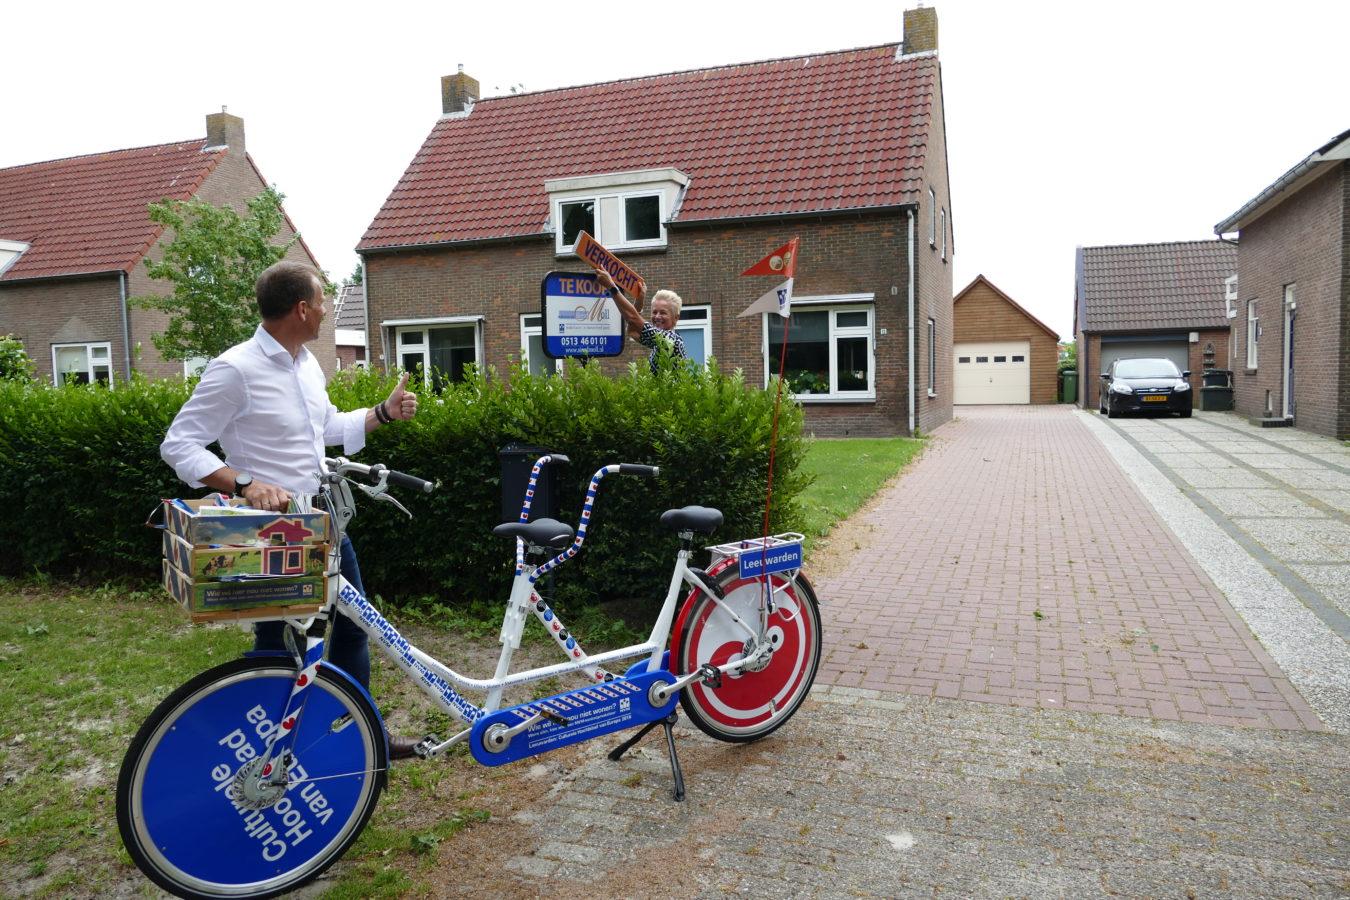 Sierd Moll en Jeannette Schram op de tandem plaatsen een verkocht bord in Jubbega